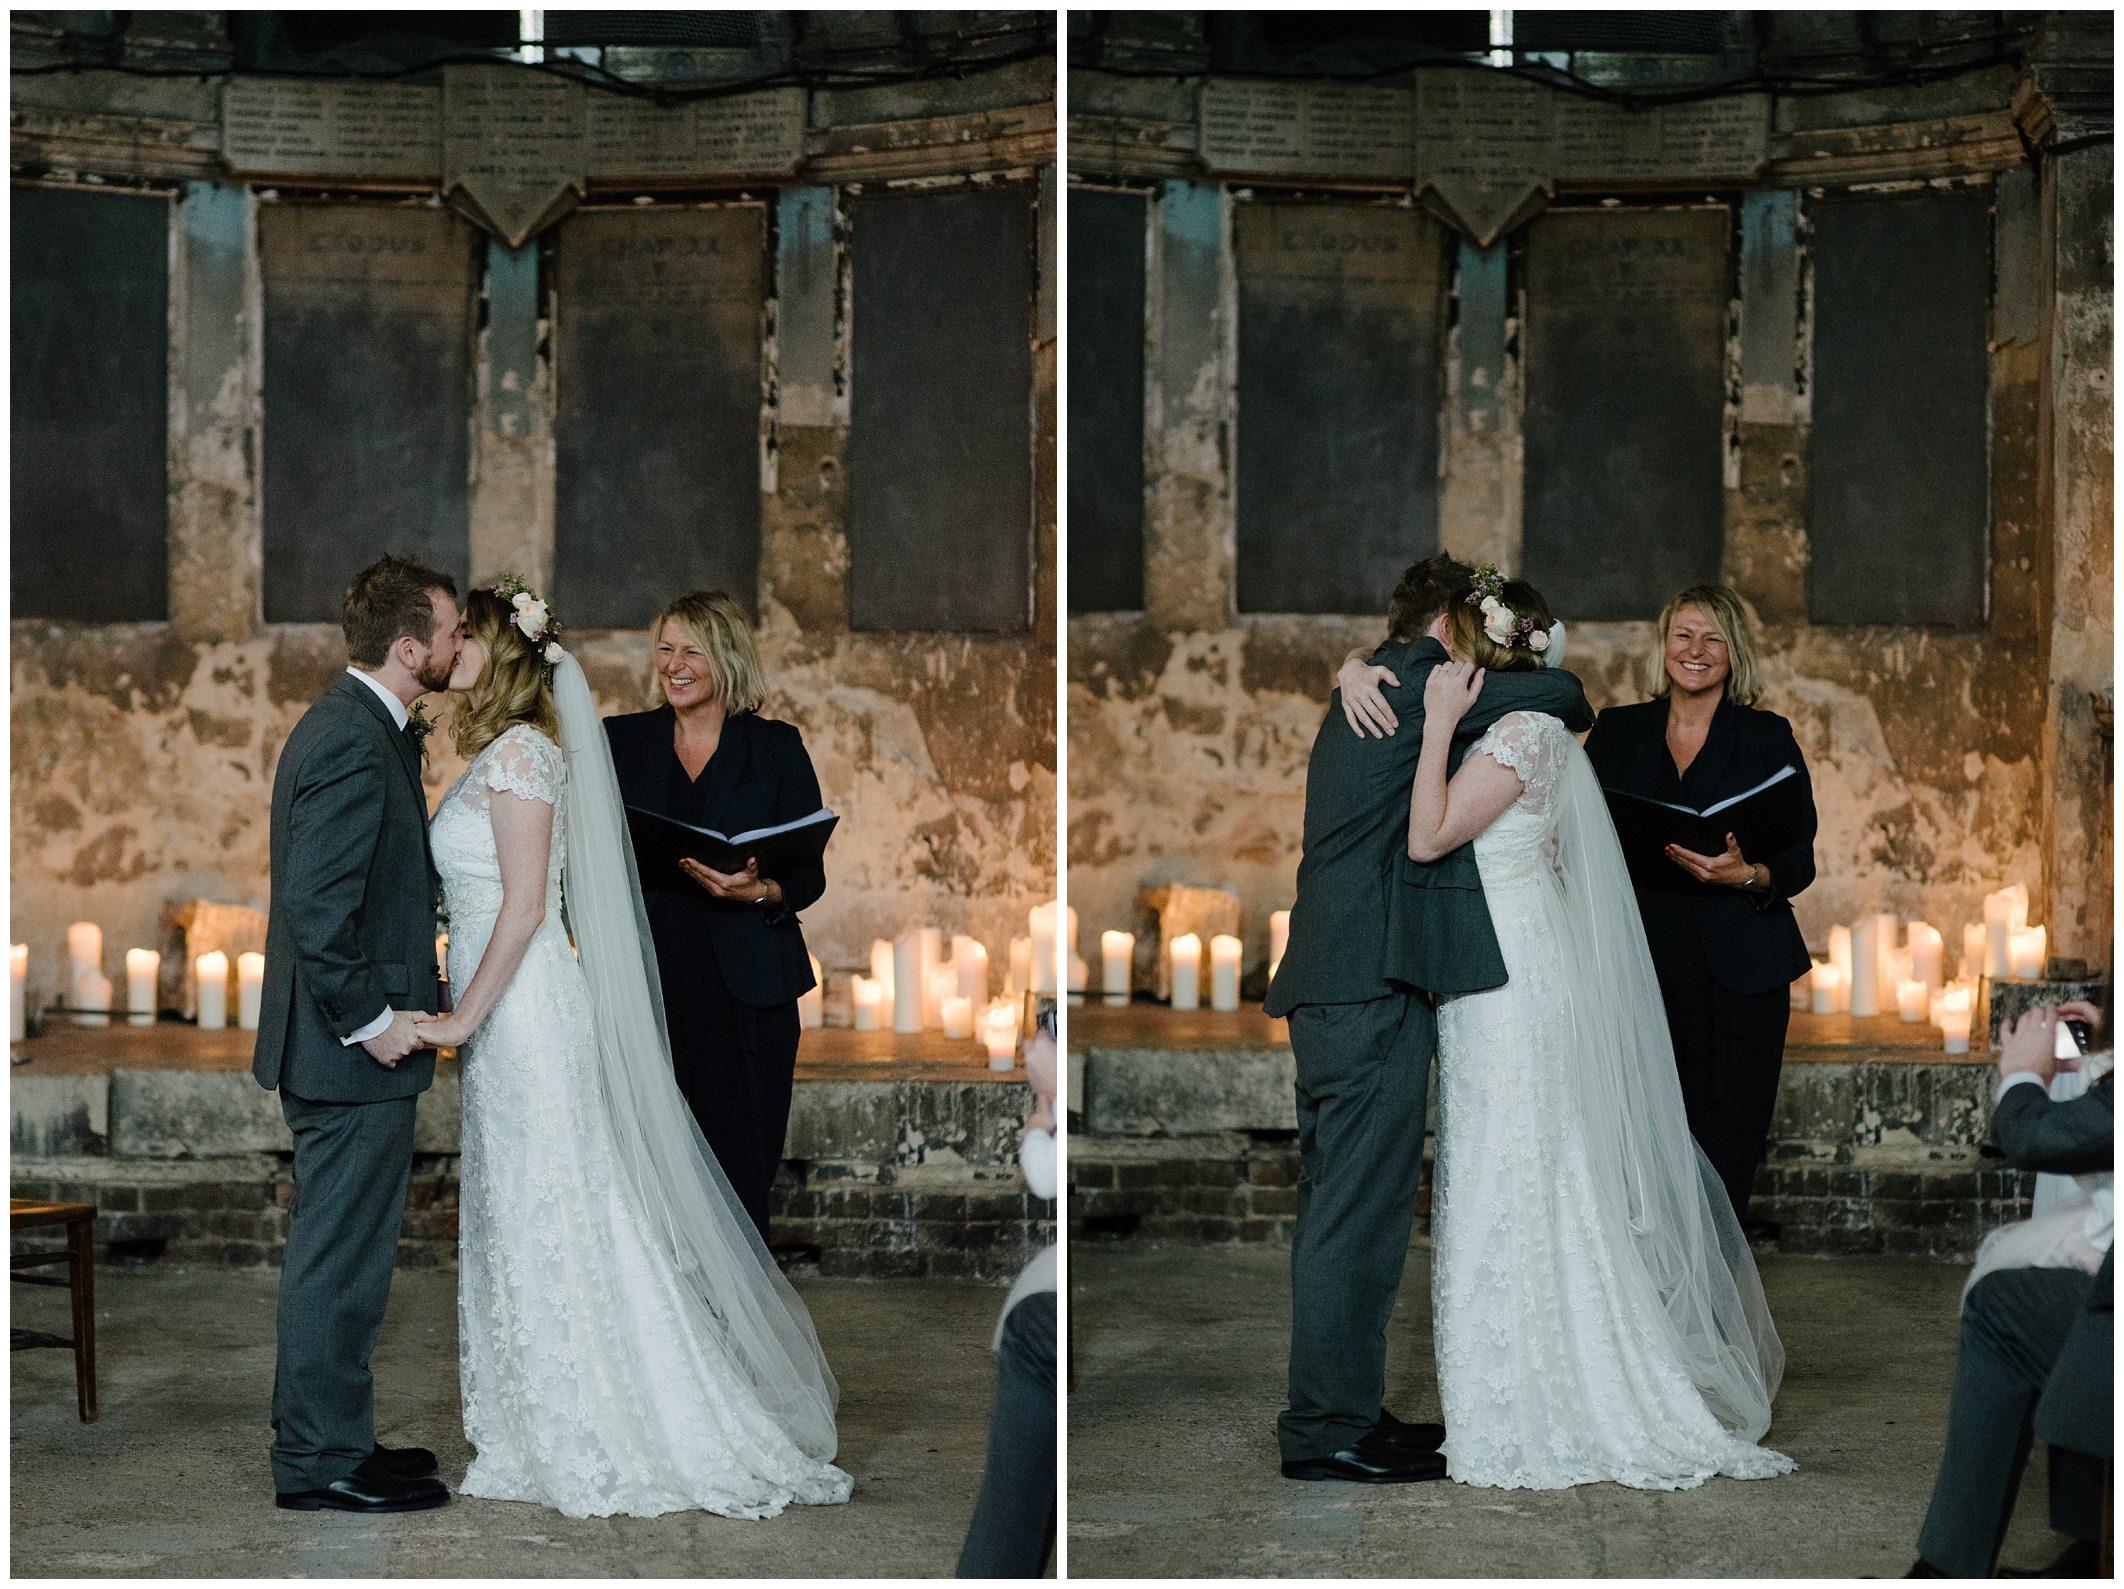 asylum_chapel_peckham_rosendale_wedding_jude_browne_photography_0070.jpg